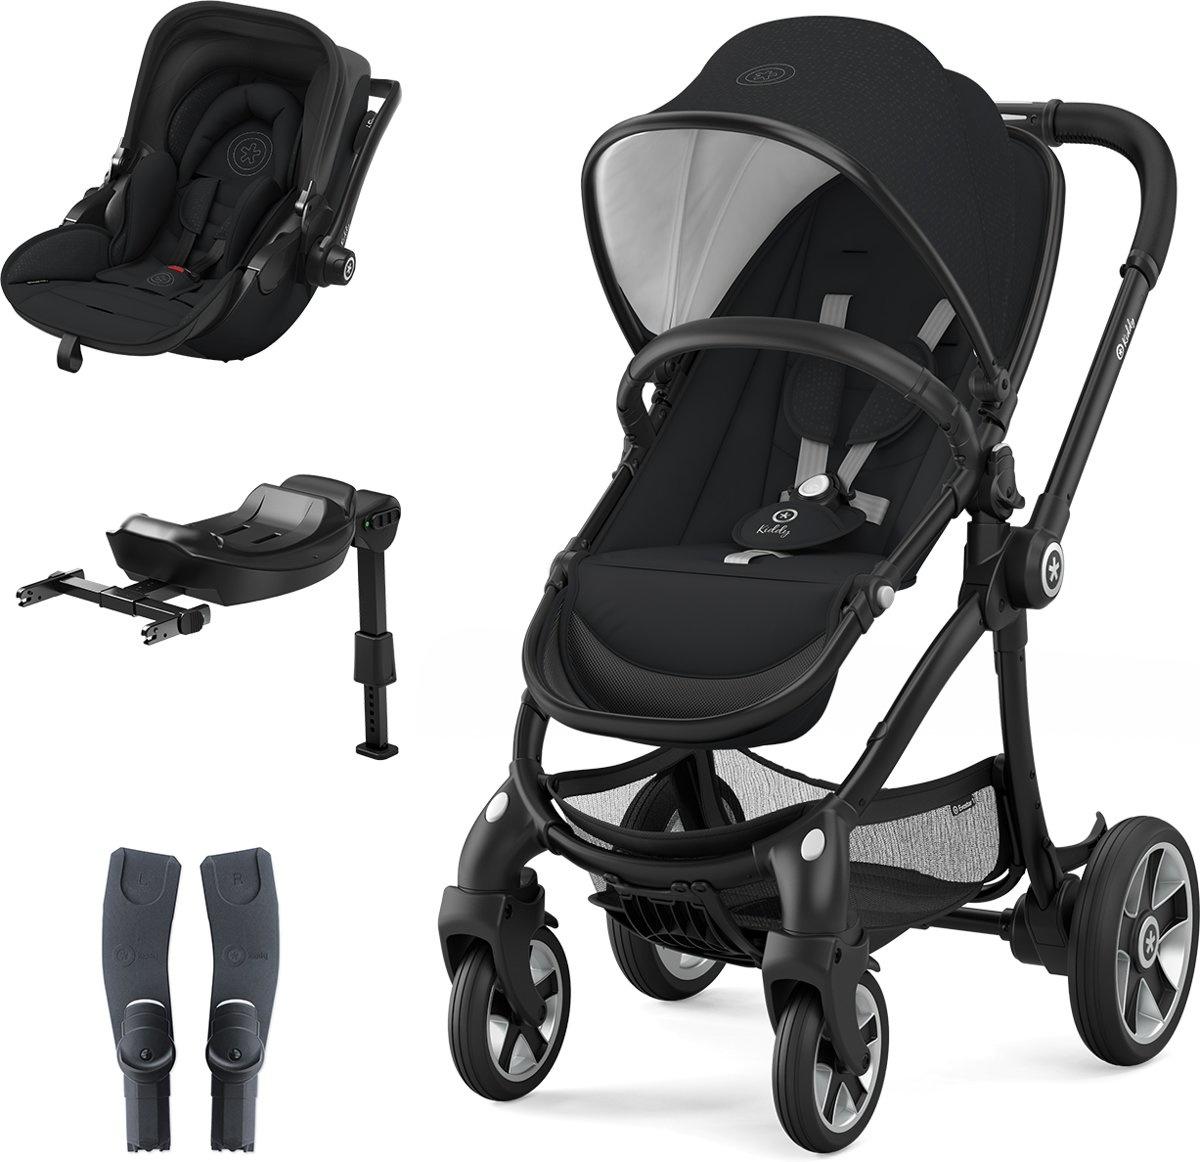 Kiddy Evostar 1 incl. Kinderwagen (frame en zitje) + Evoluna i-Size (stoeltje) + Isofix Base 2 + ada